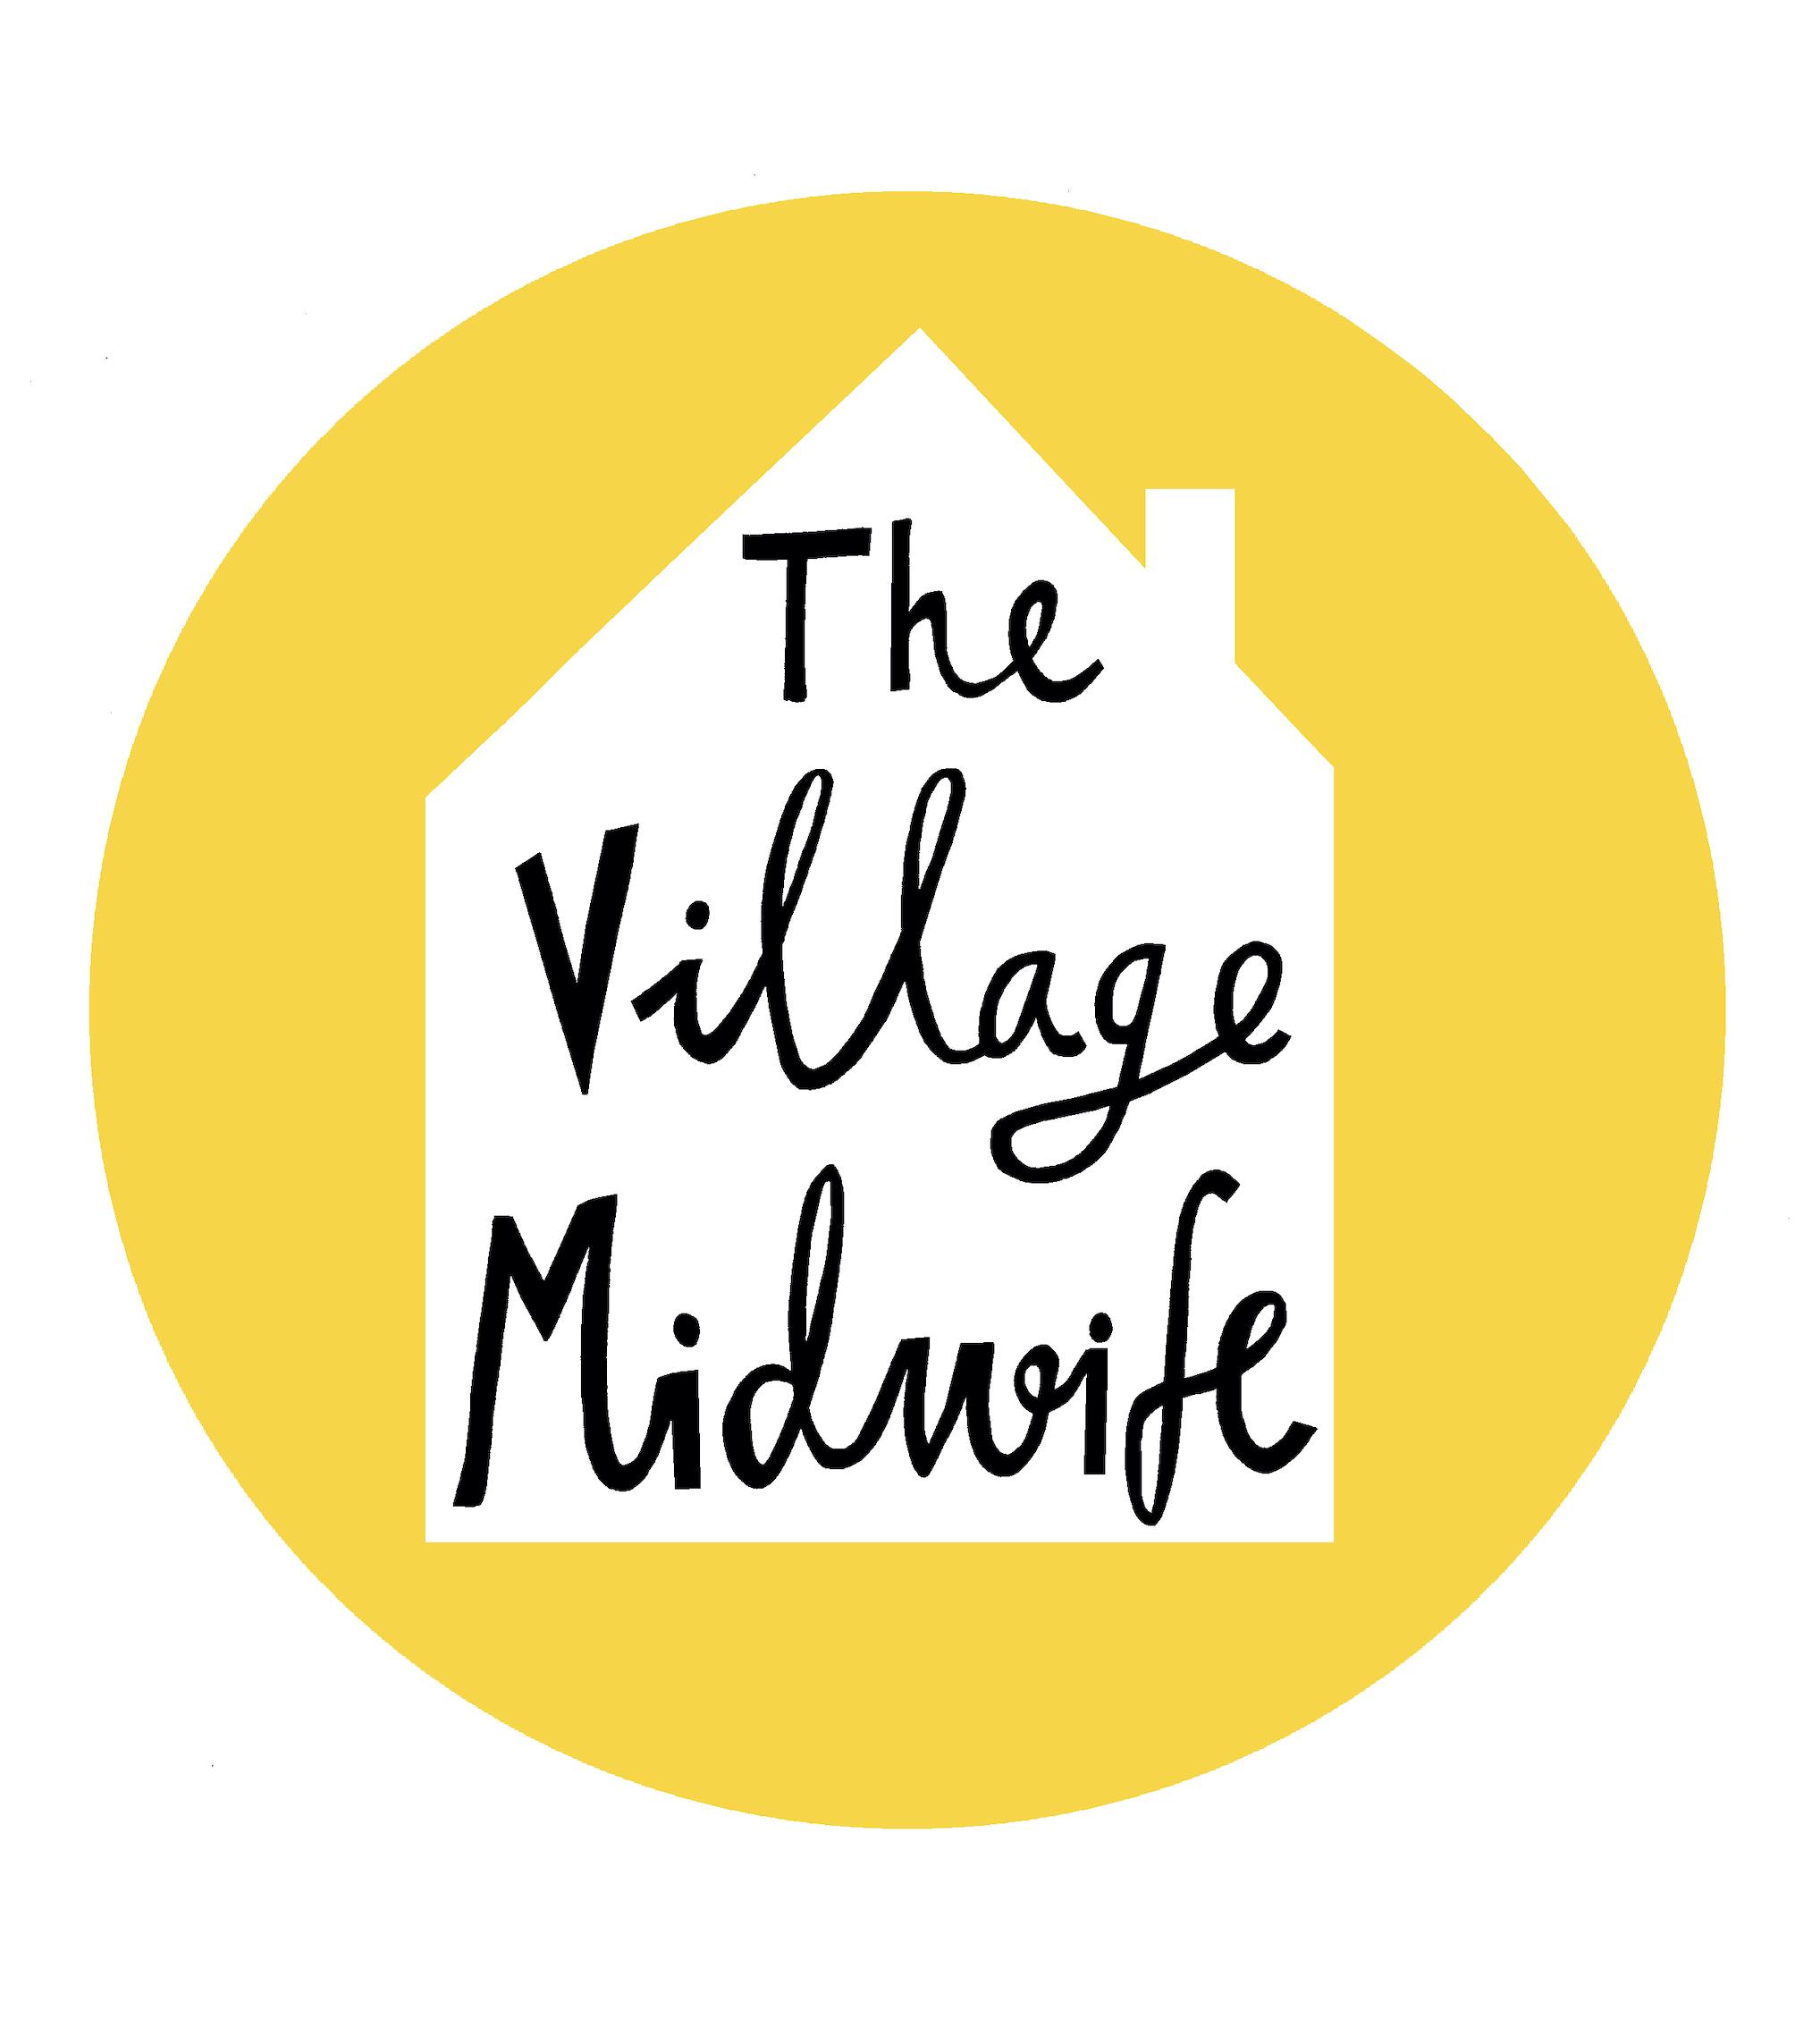 The Village Midwife's logo